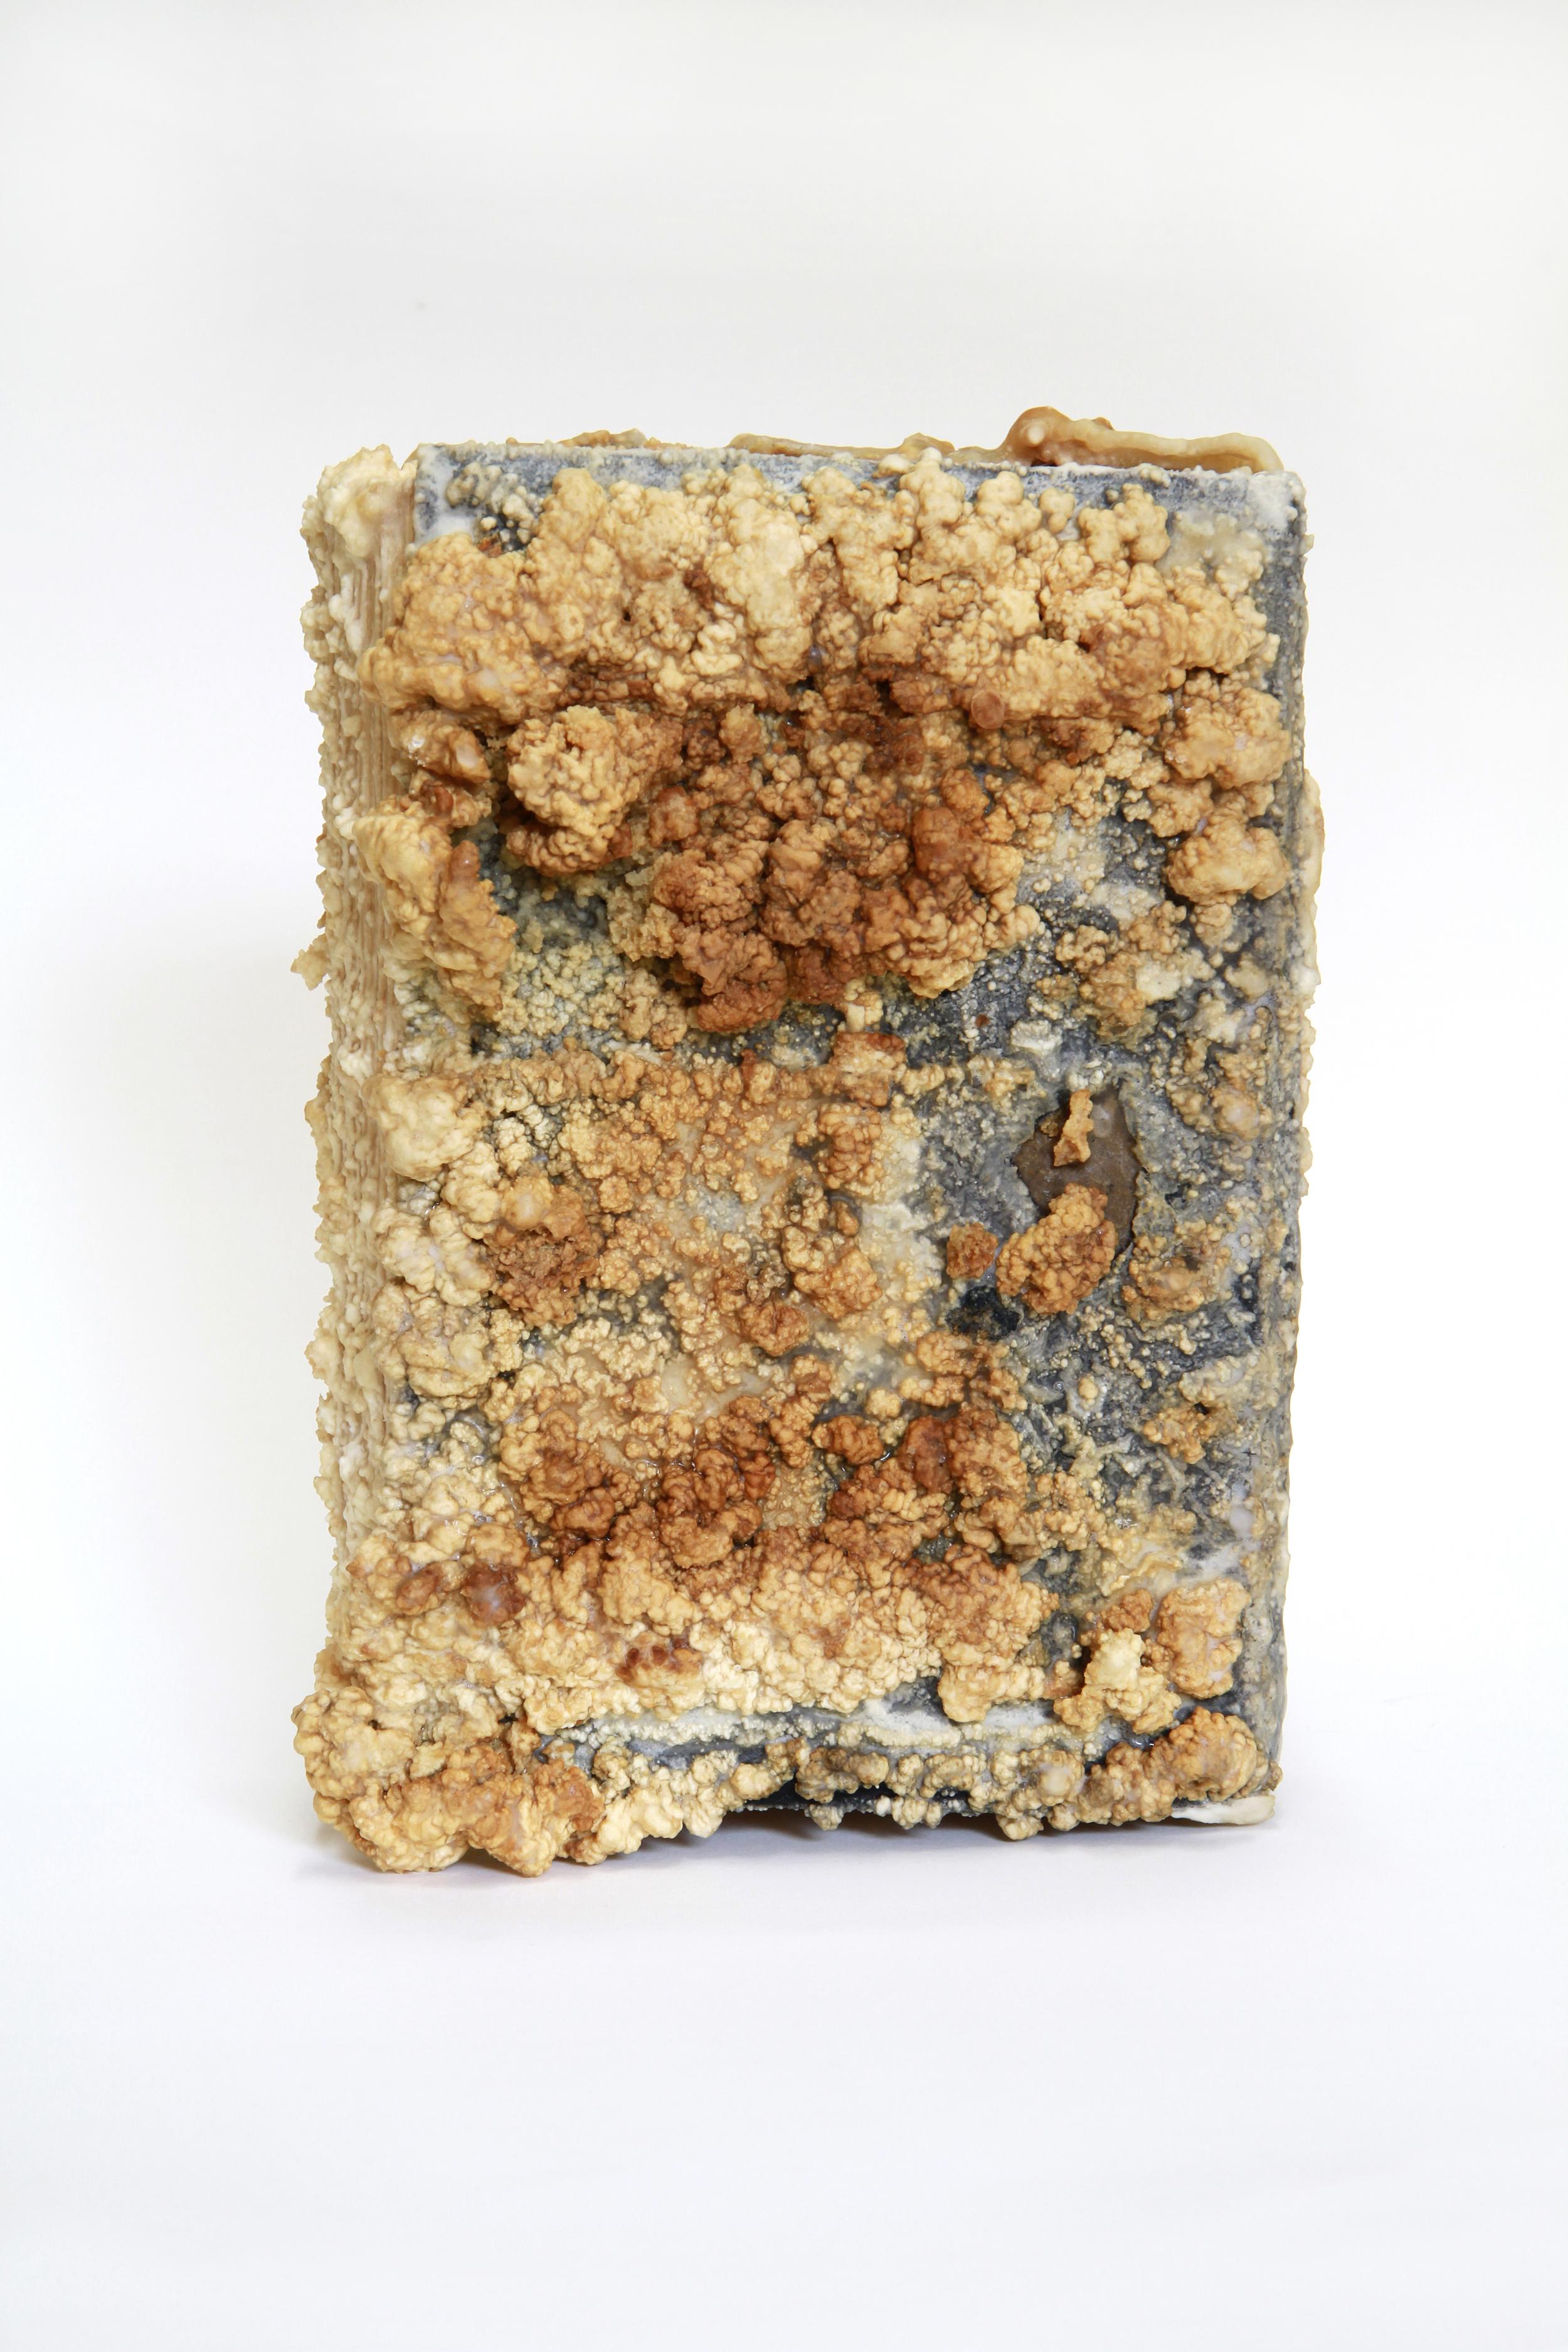 Relic (Amy Vanderbilt's Complete Book of Etiquette, Amy Vanderbilt)  2013 Found book, monosodium glutamate (MSG), epoxy 7x9.5x3.5 inches